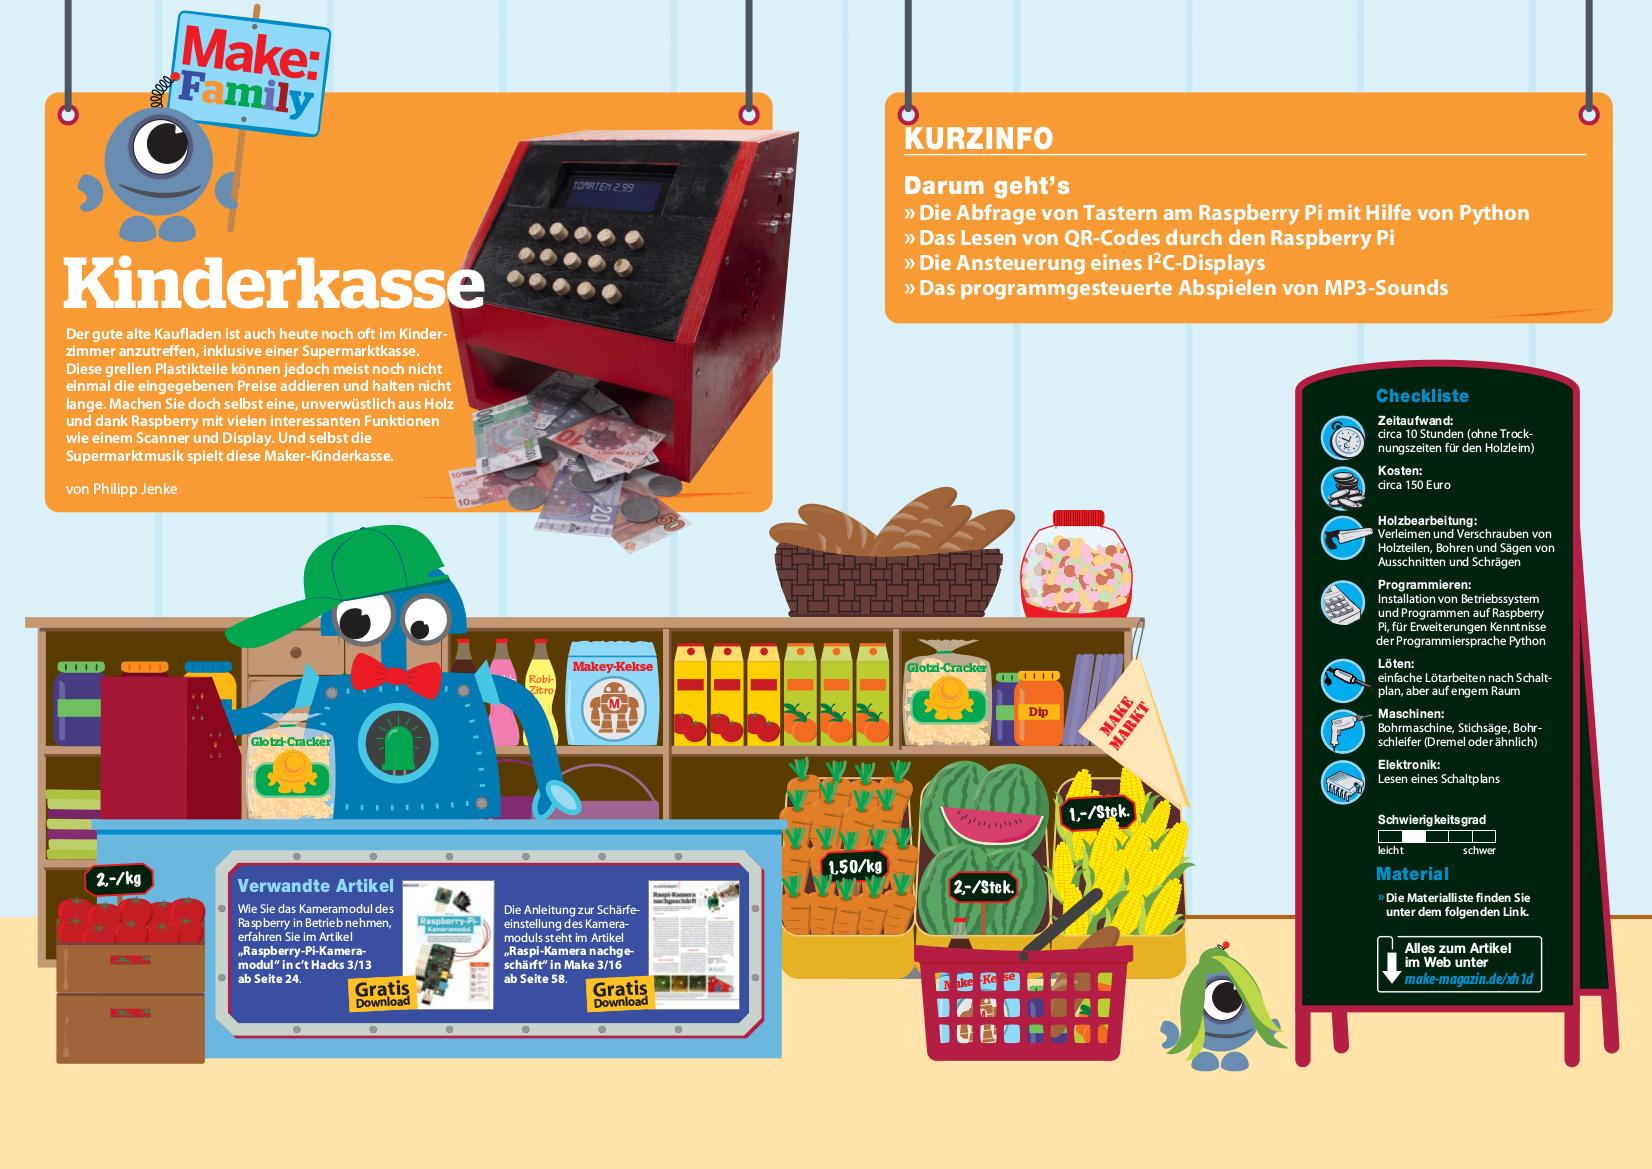 Kinderkasse | Make Magazin | Heise Select